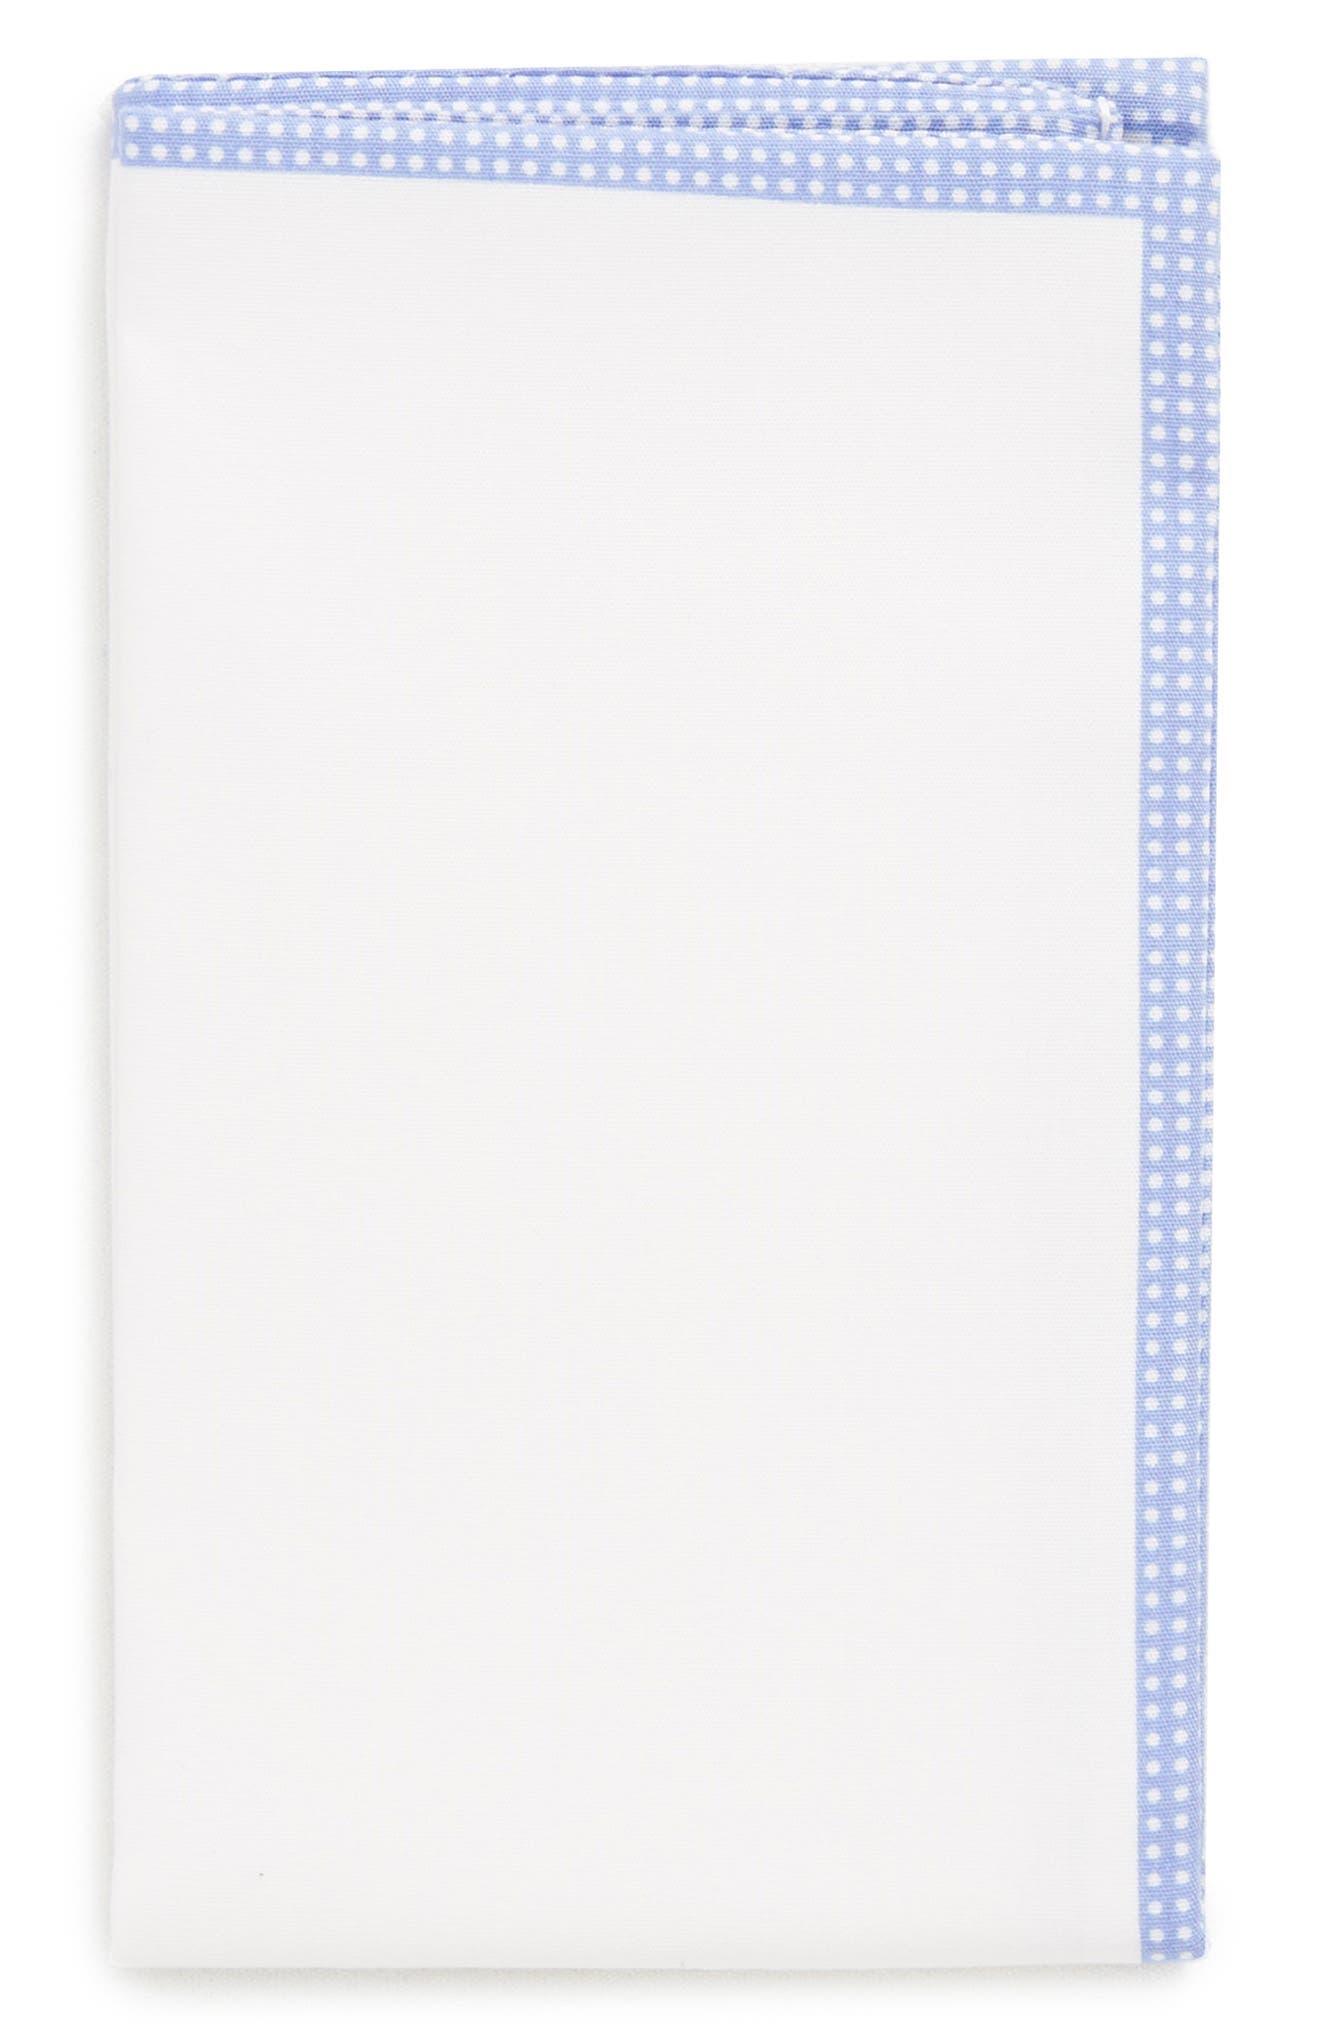 Alternate Image 1 Selected - Nordstrom Men's Shop The Perfect Pre-Folded Pocket Square (3 for $49)